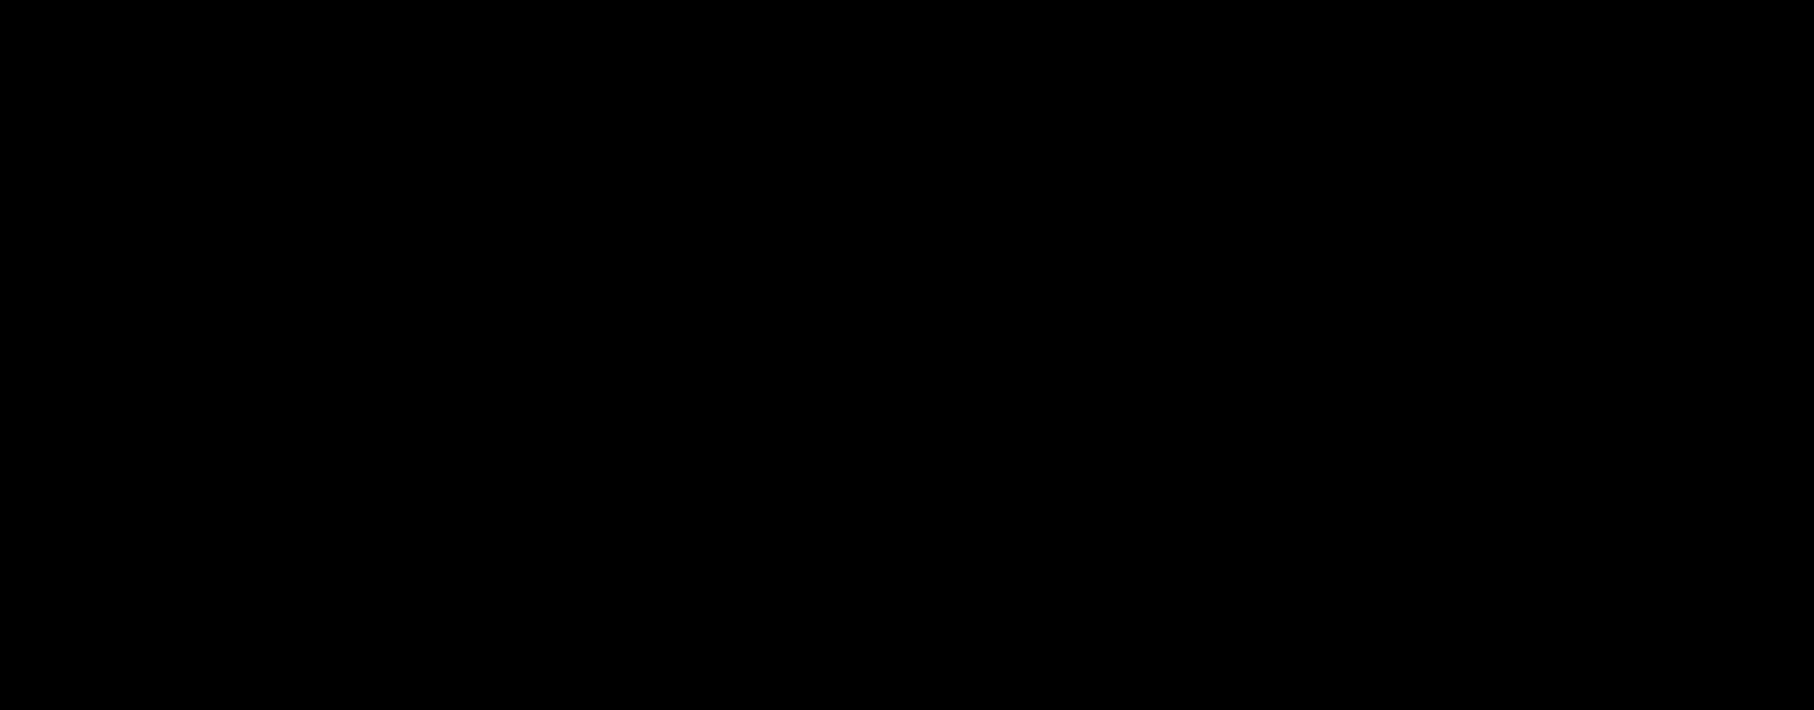 Belinostat-d<sub>5</sub>